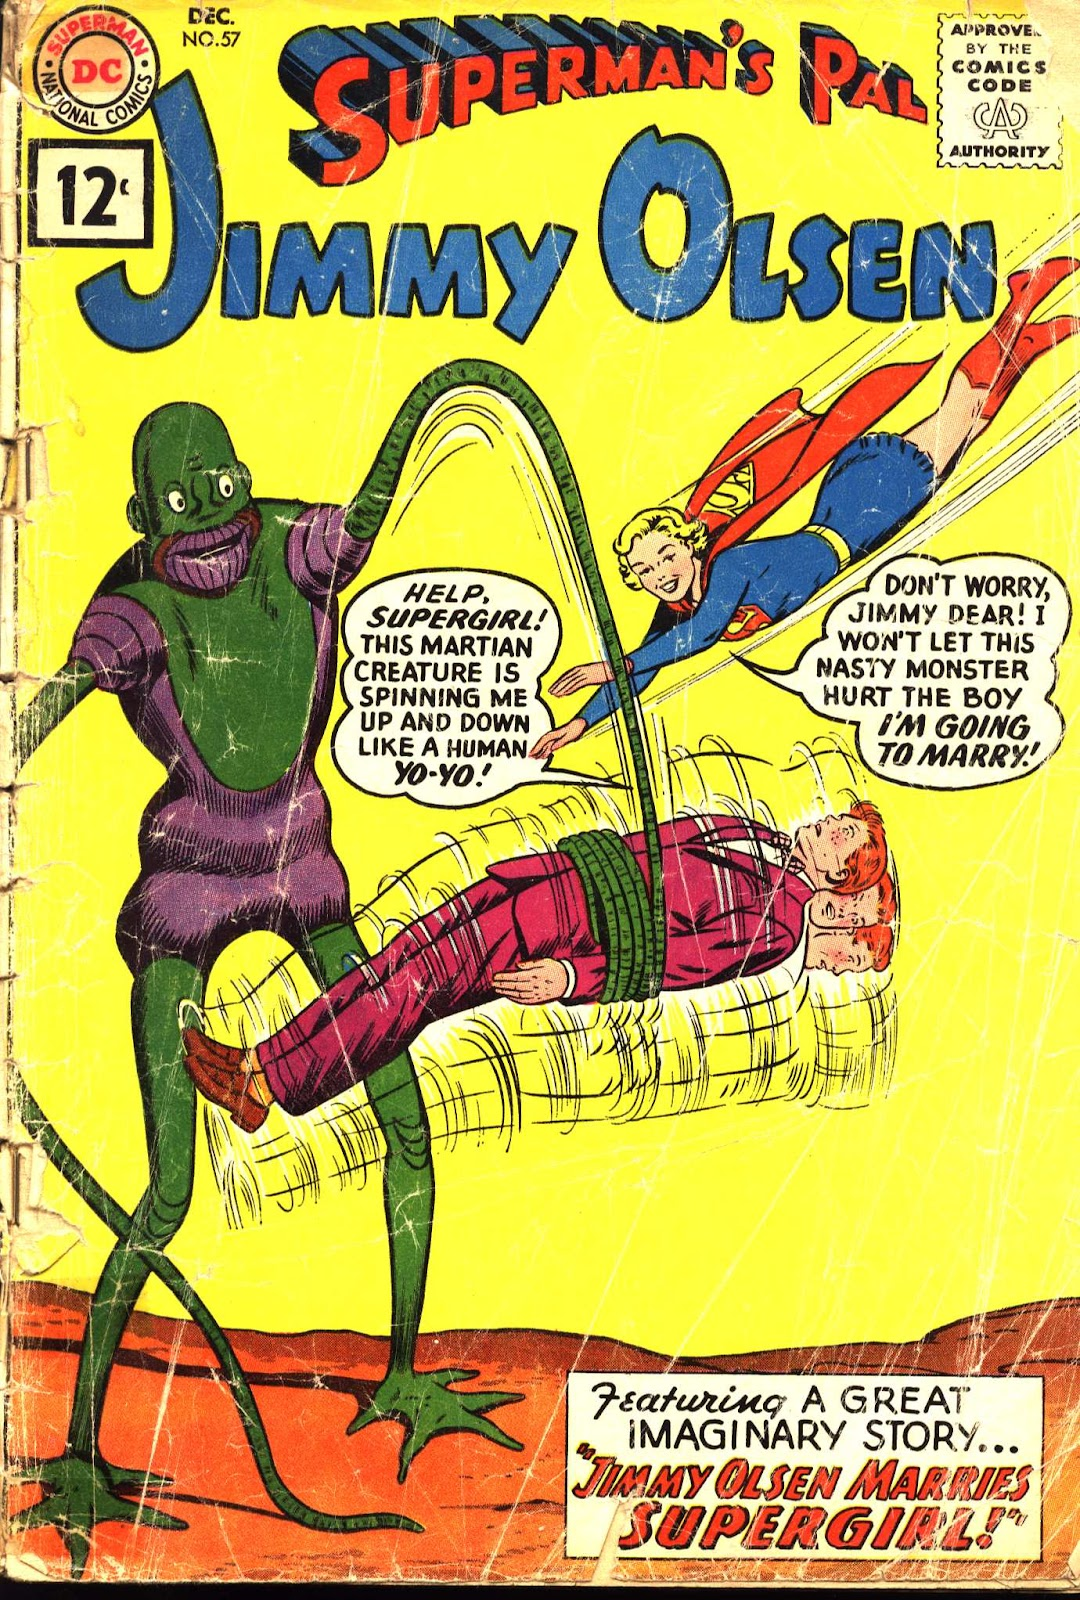 Supermans Pal Jimmy Olsen (1954) 57 Page 1